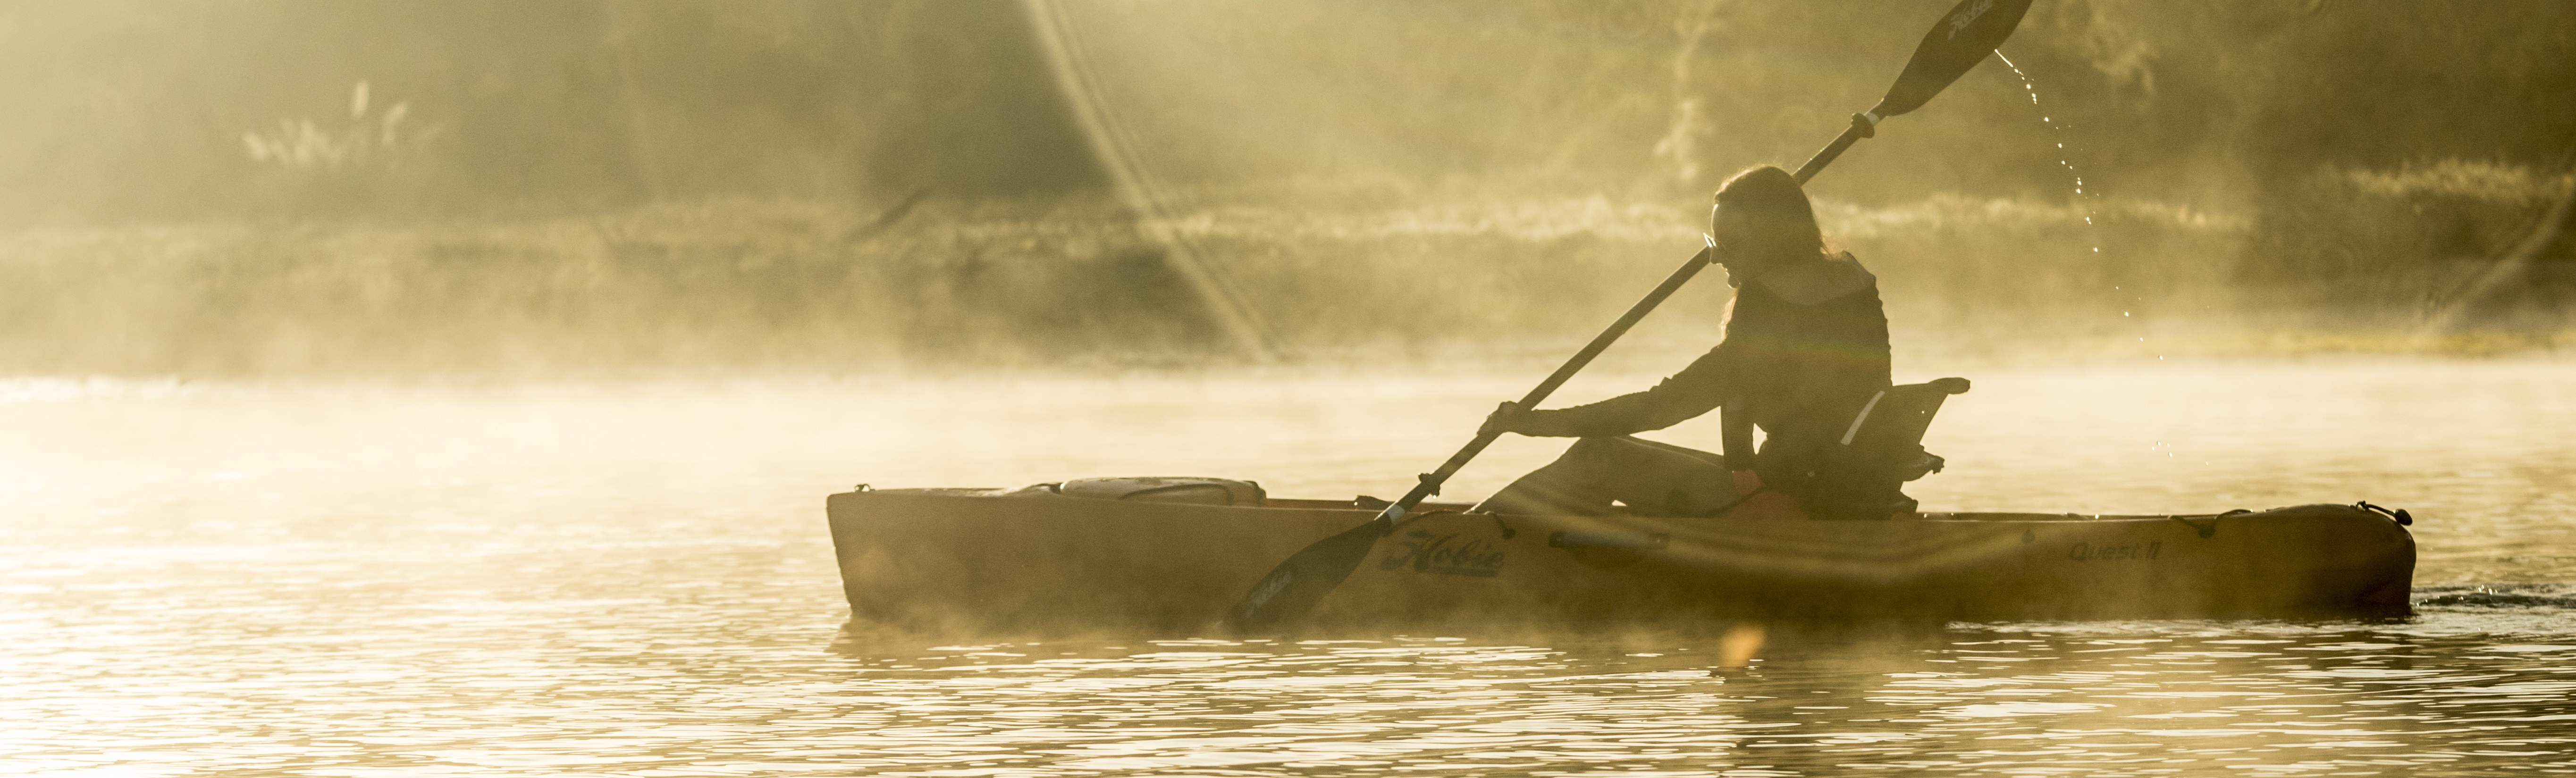 hobie-kayak-banner-img.jpg